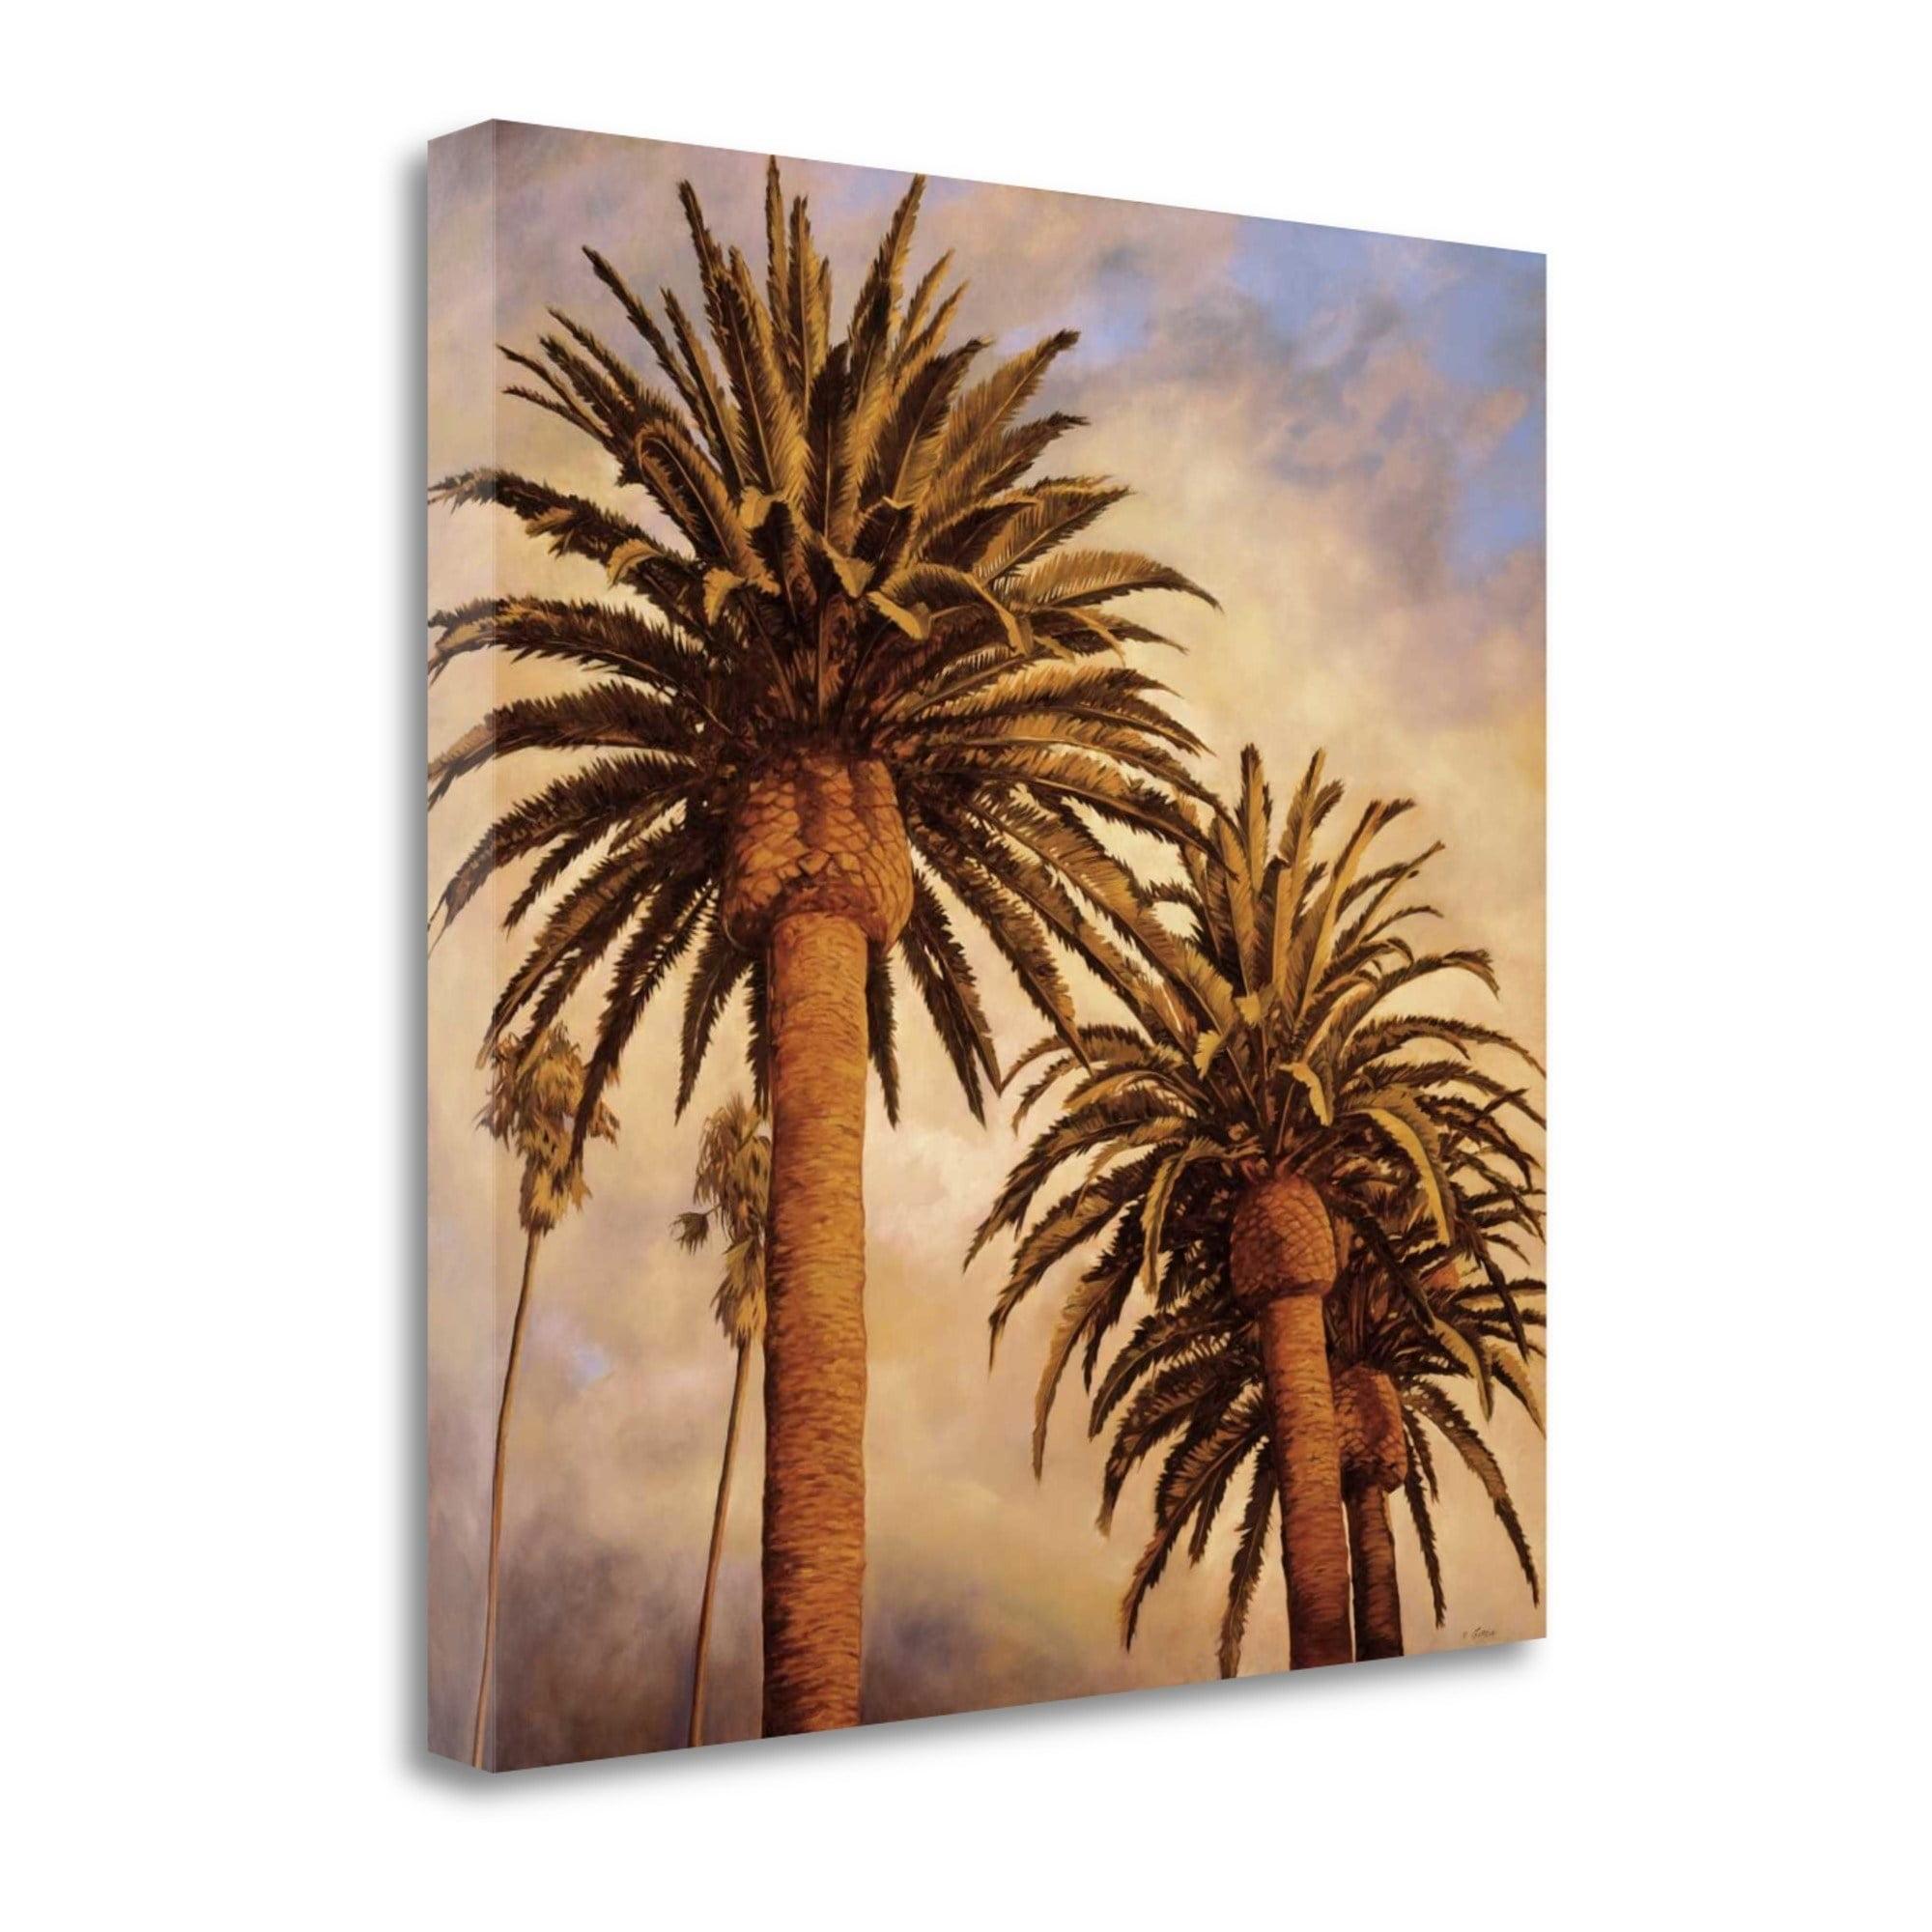 Fog Over Canary Palms By Rick Garcia Graphic Art On Wrapped Canvas Walmart Com Walmart Com